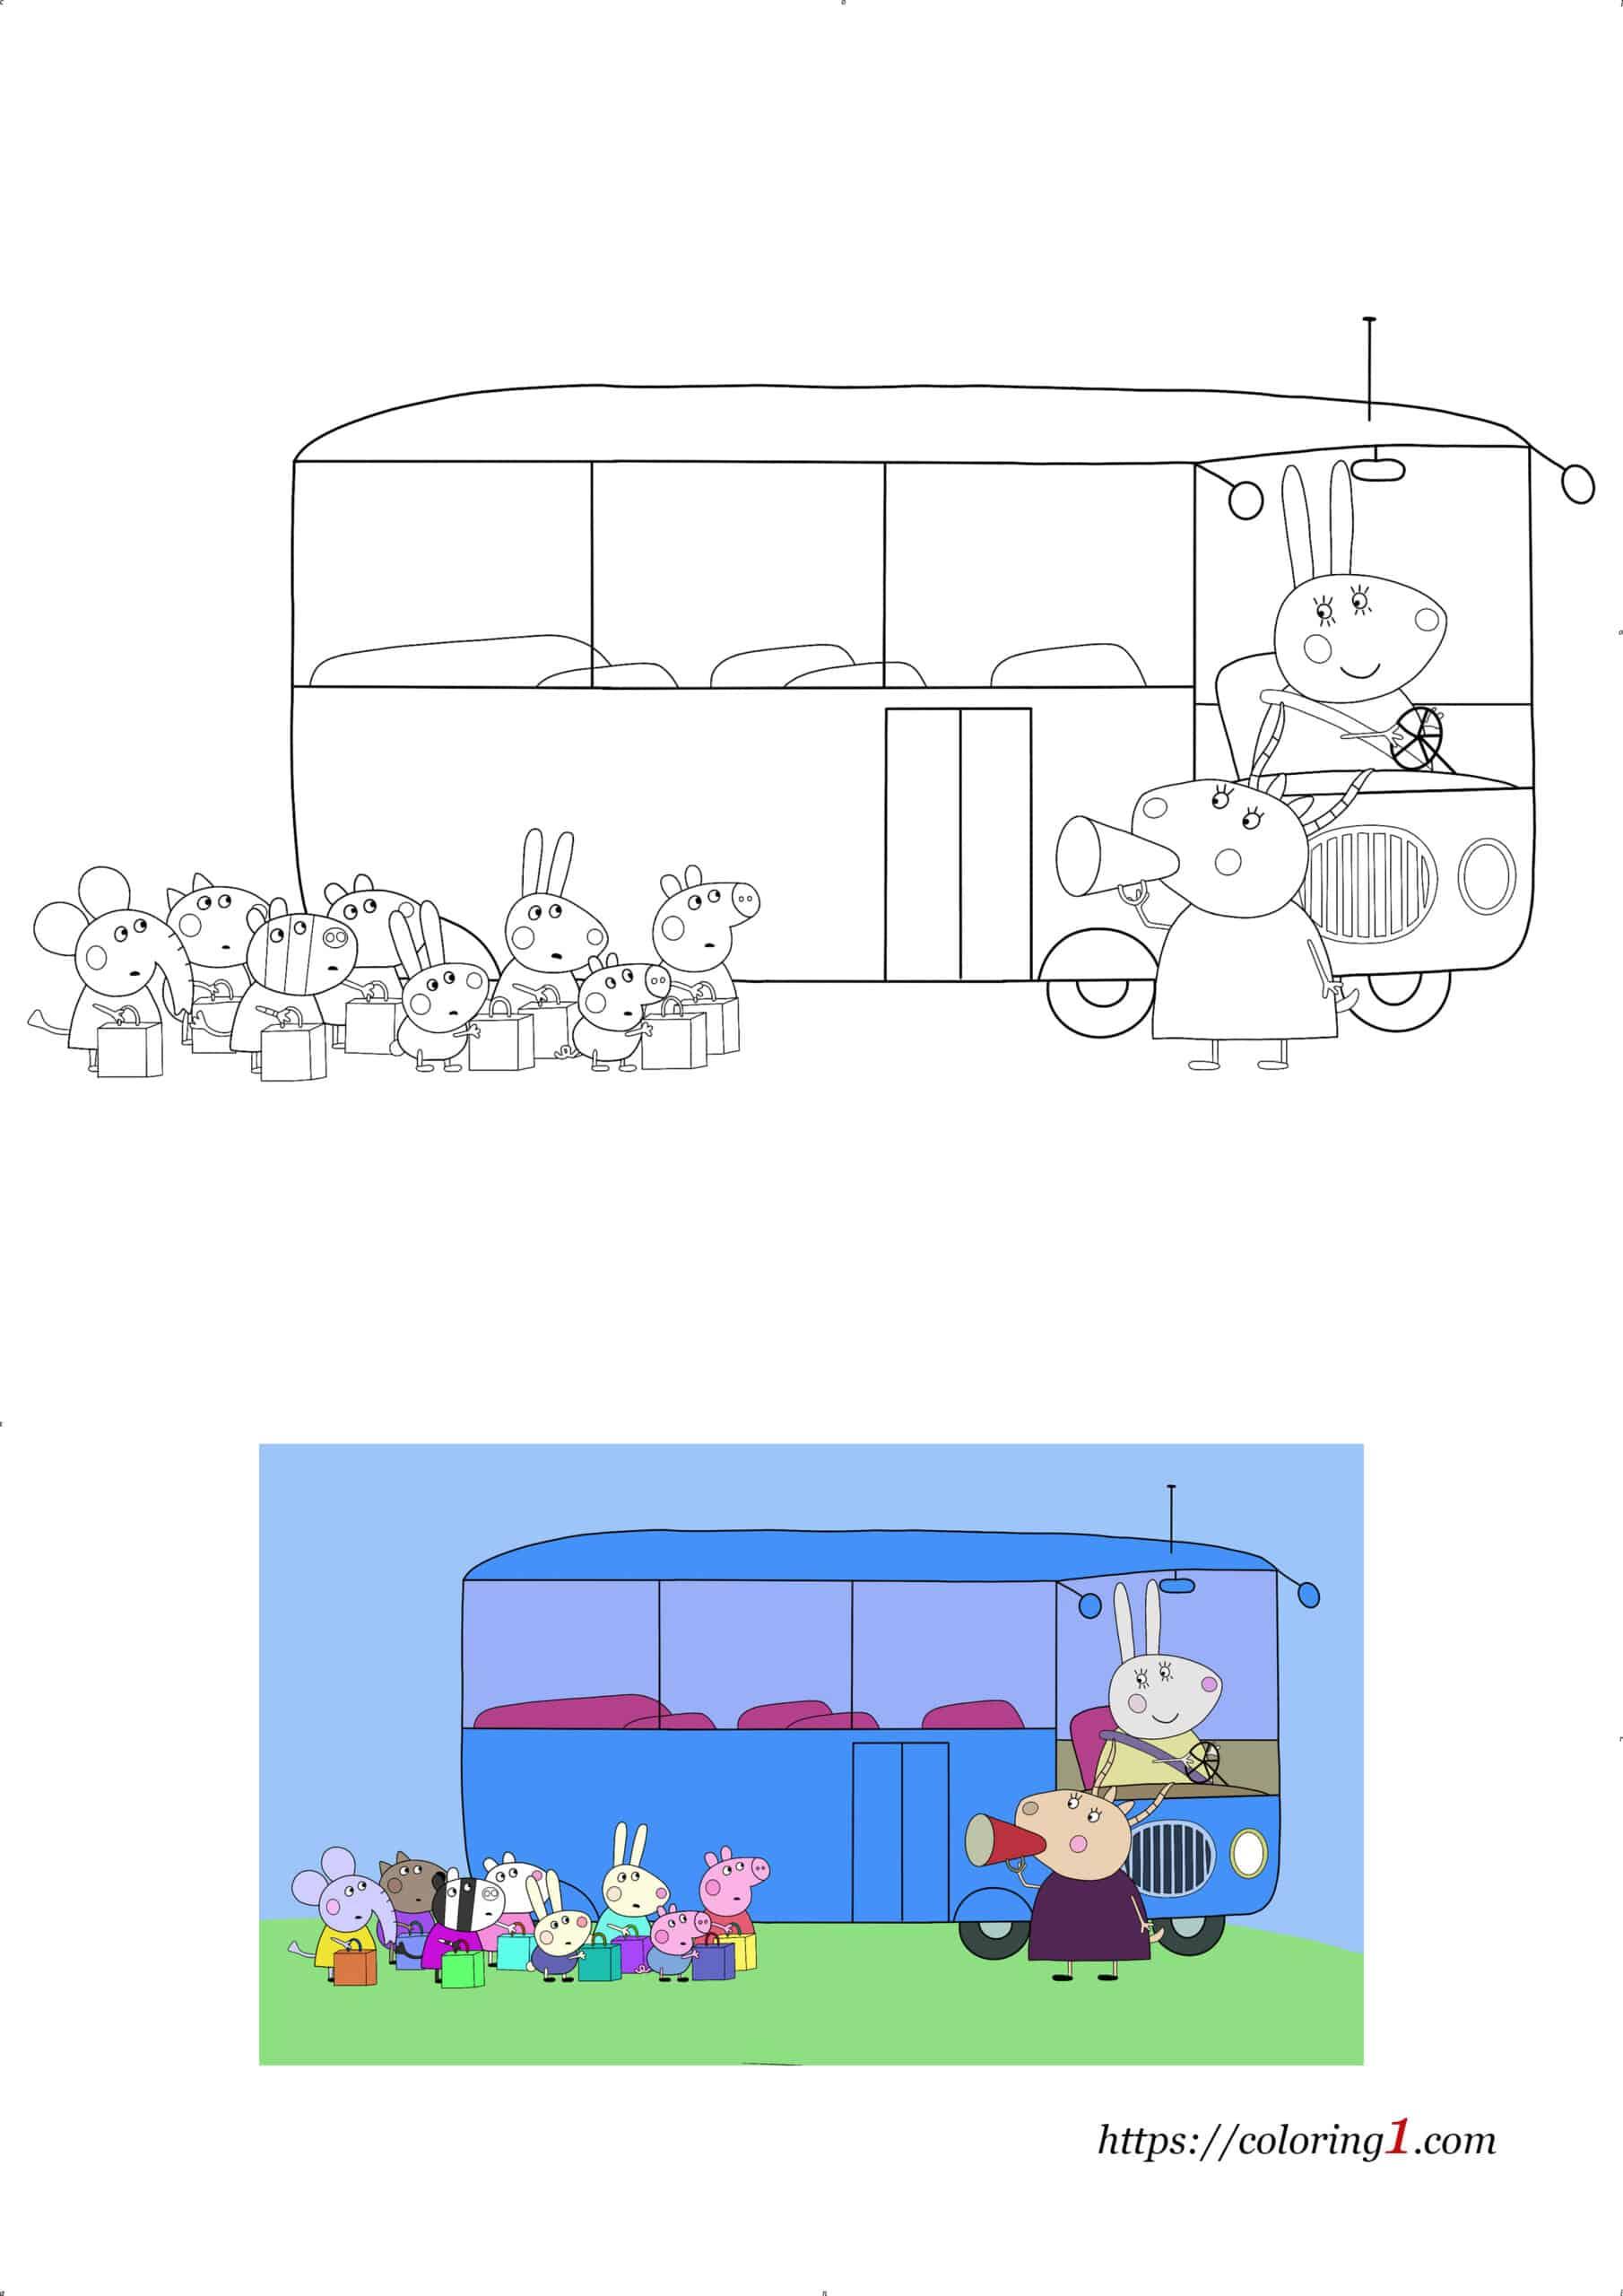 Peppa Pig School Bus coloring page pdf